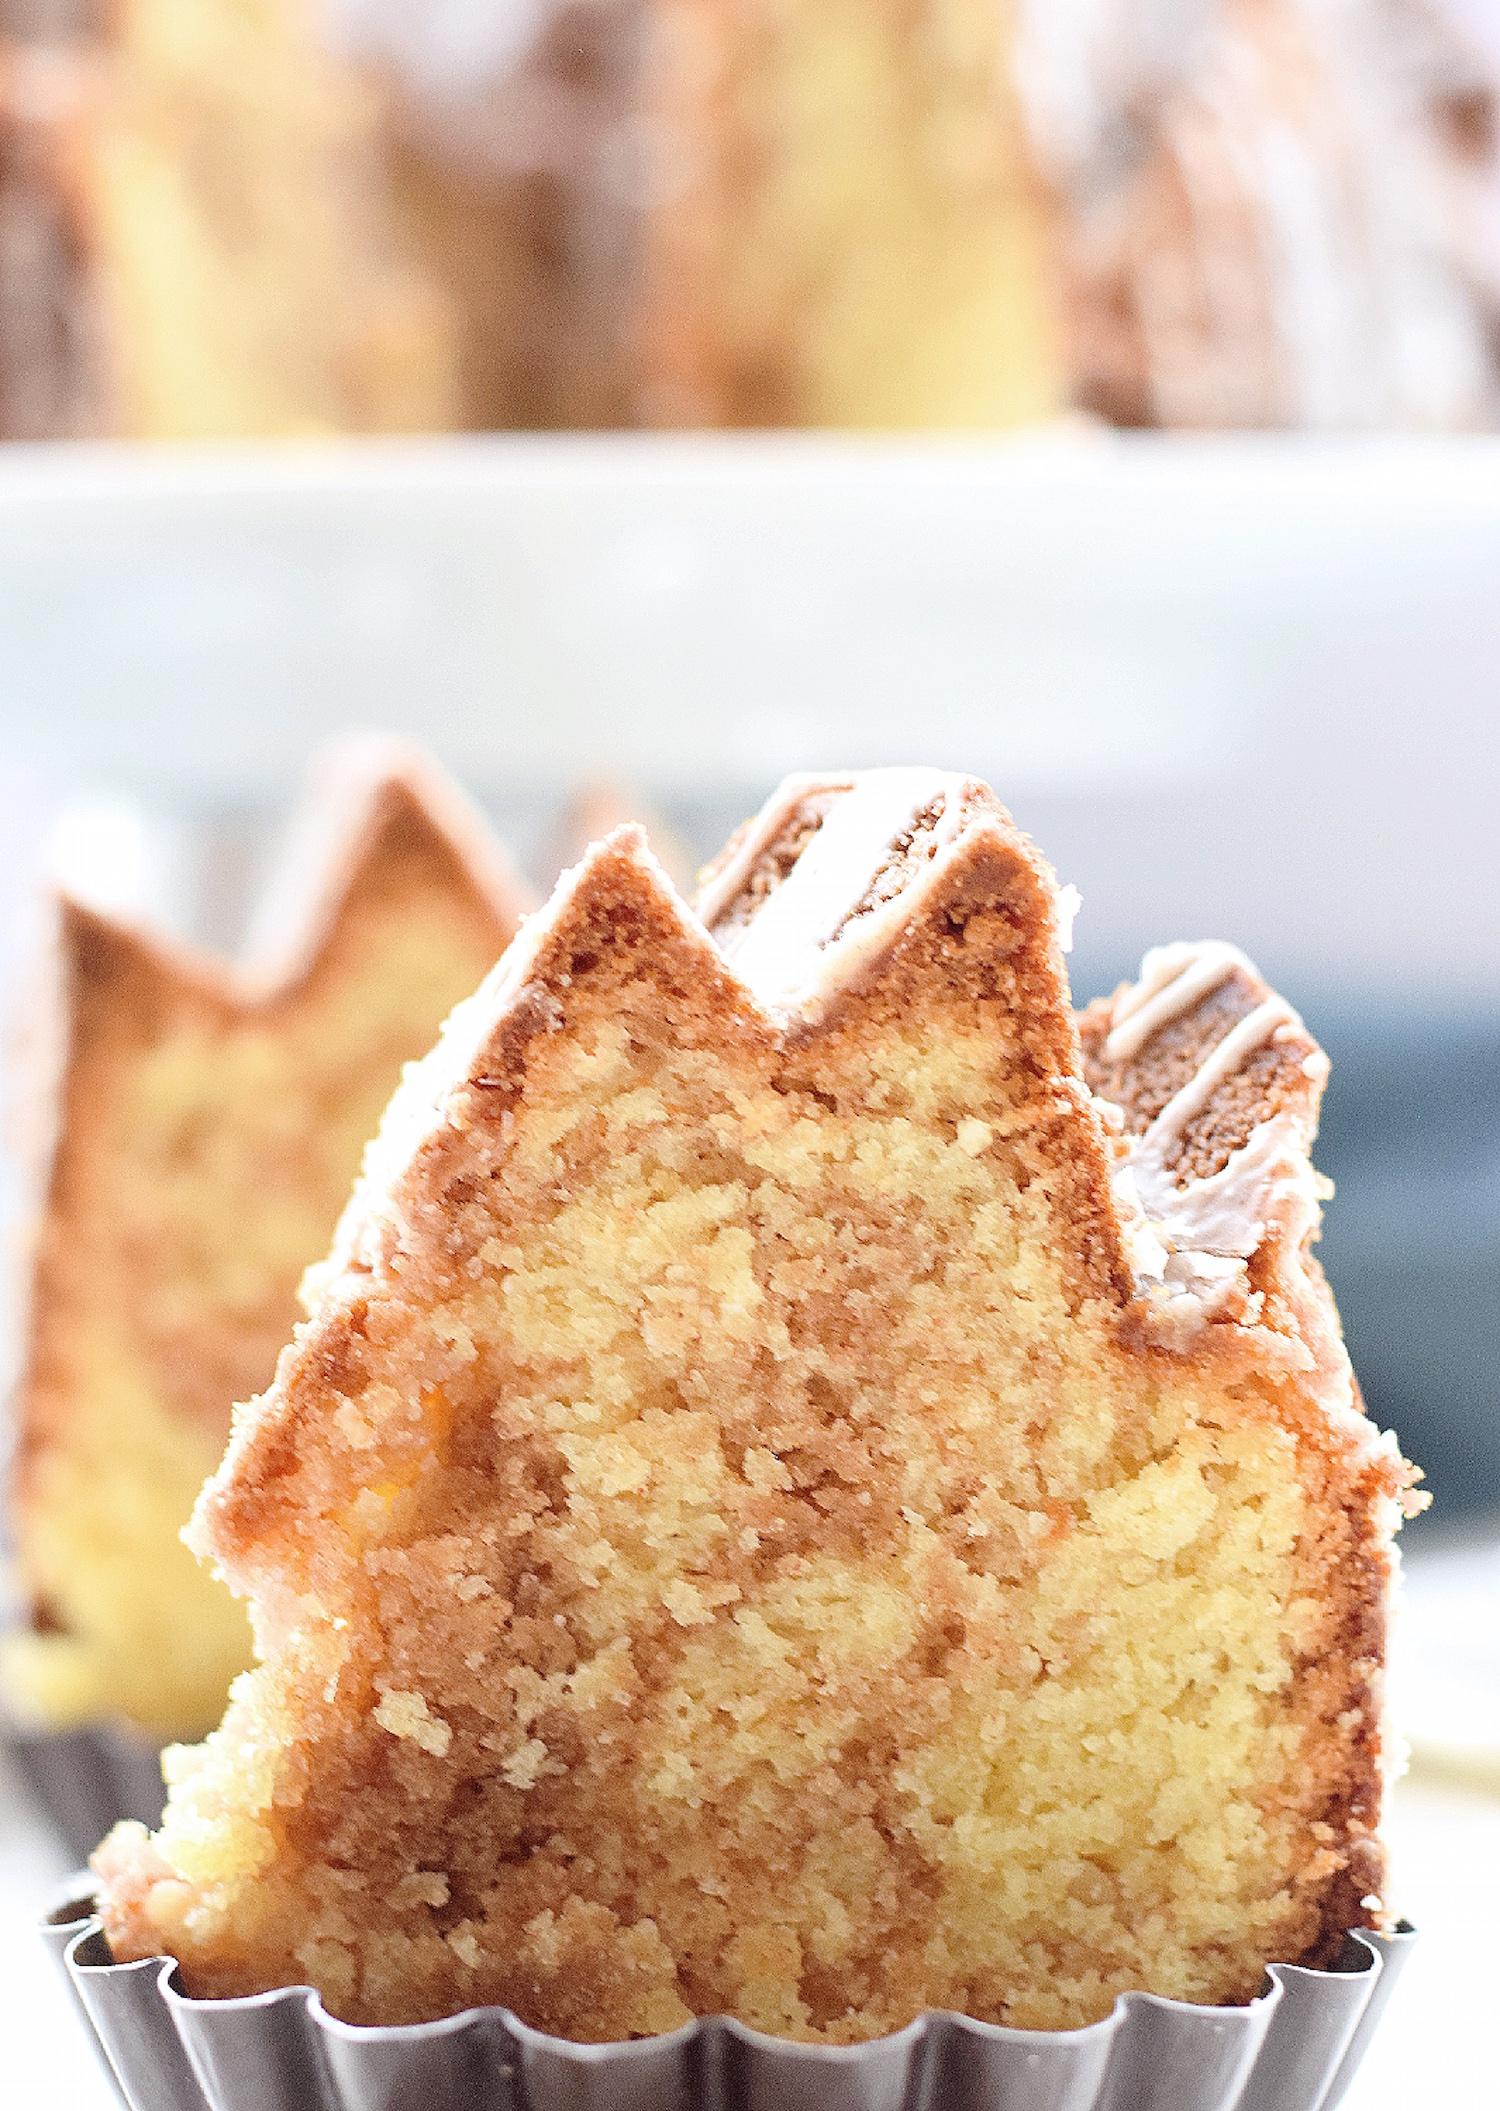 Cinnamon Swirl Bundt Cake: one bowl, moist, tender vanilla Bundt cake with cinnamon swirls. Quick, easy and completely non-dairy! | TrufflesandTrends.com